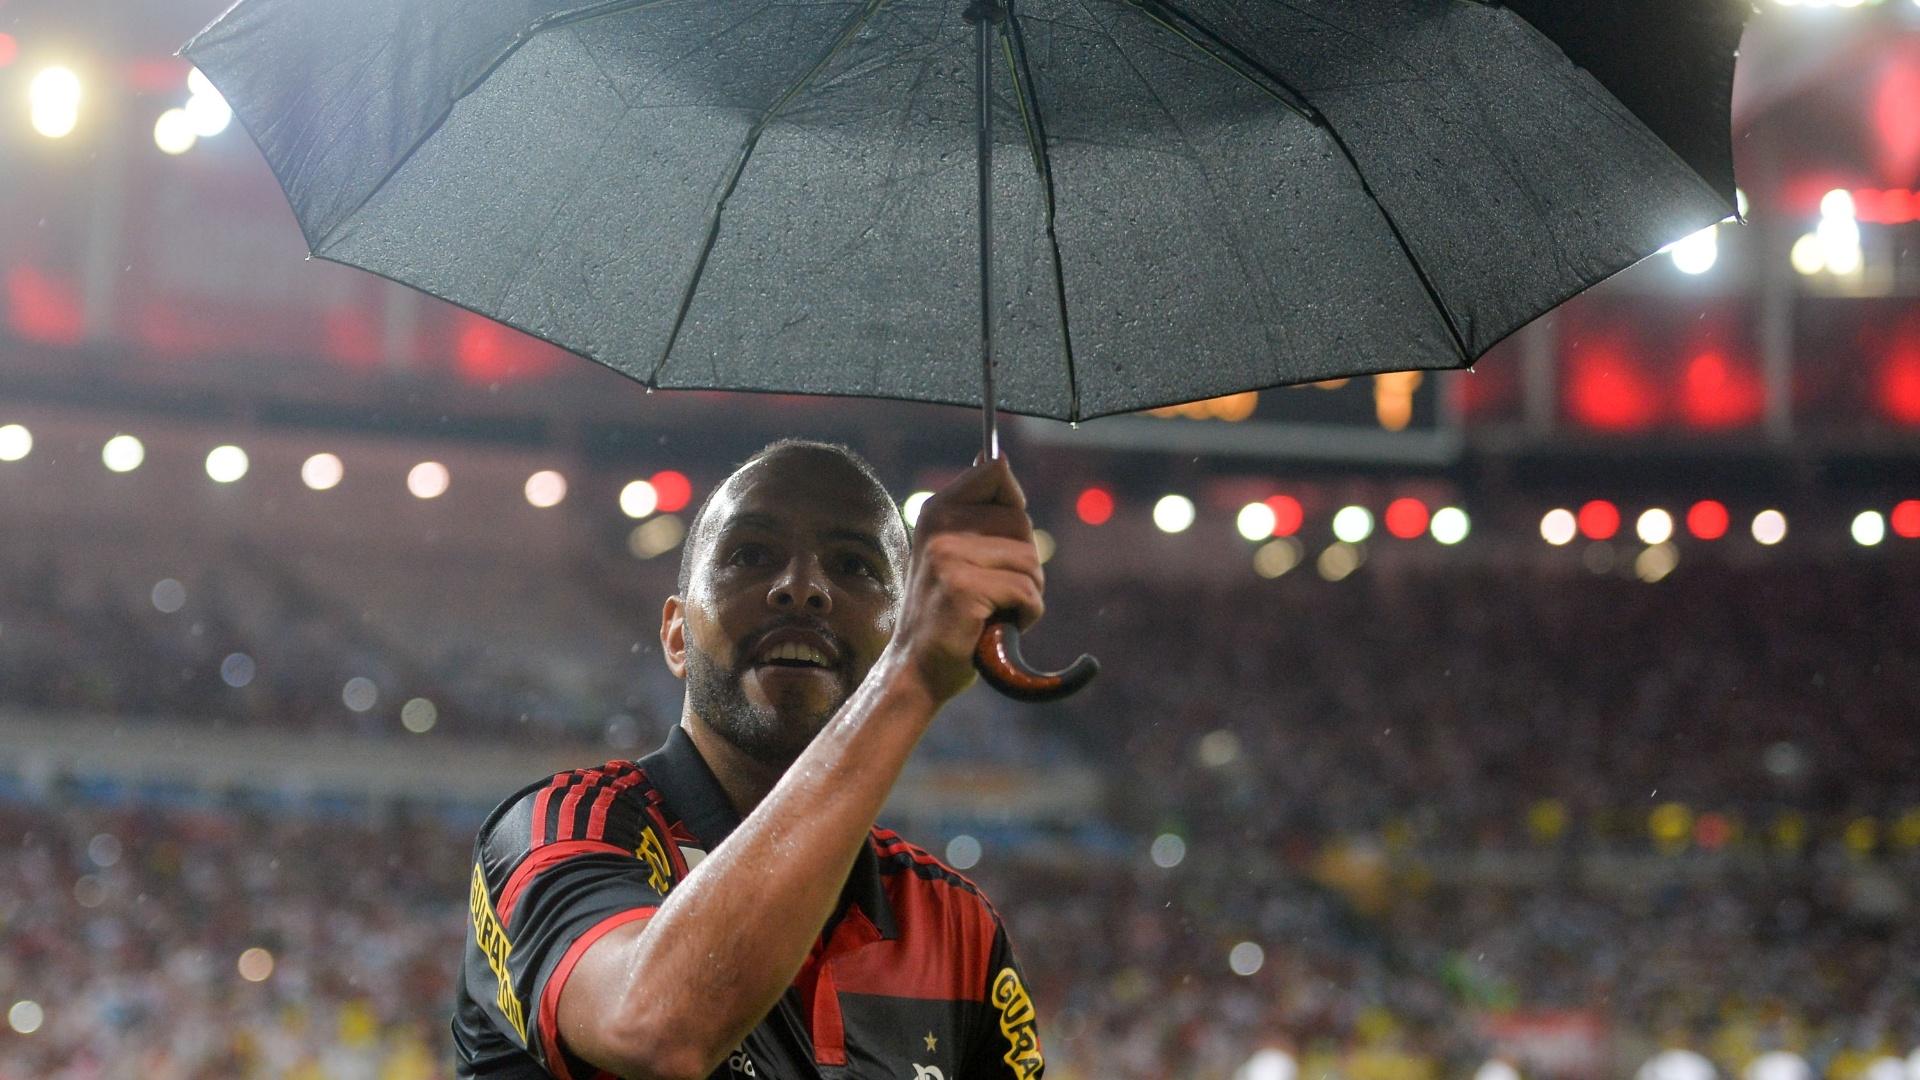 Alecsandro pega guarda-chuva para comemorar gol do Flamengo